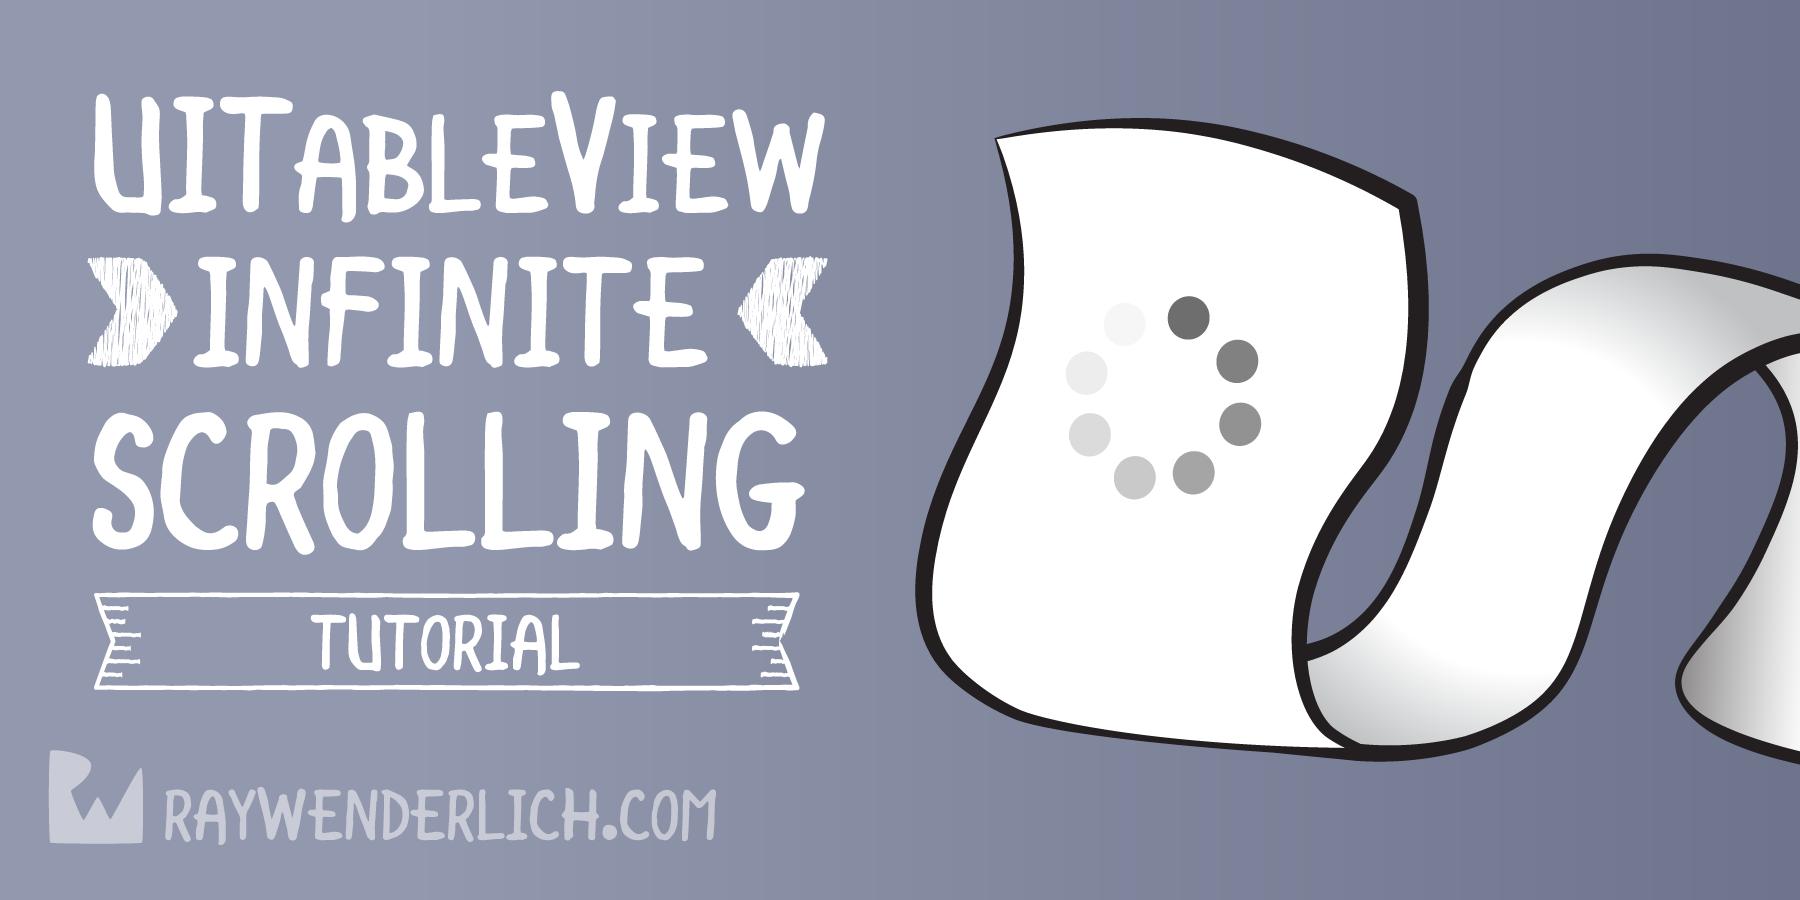 UITableView Infinite Scrolling Tutorial | raywenderlich com